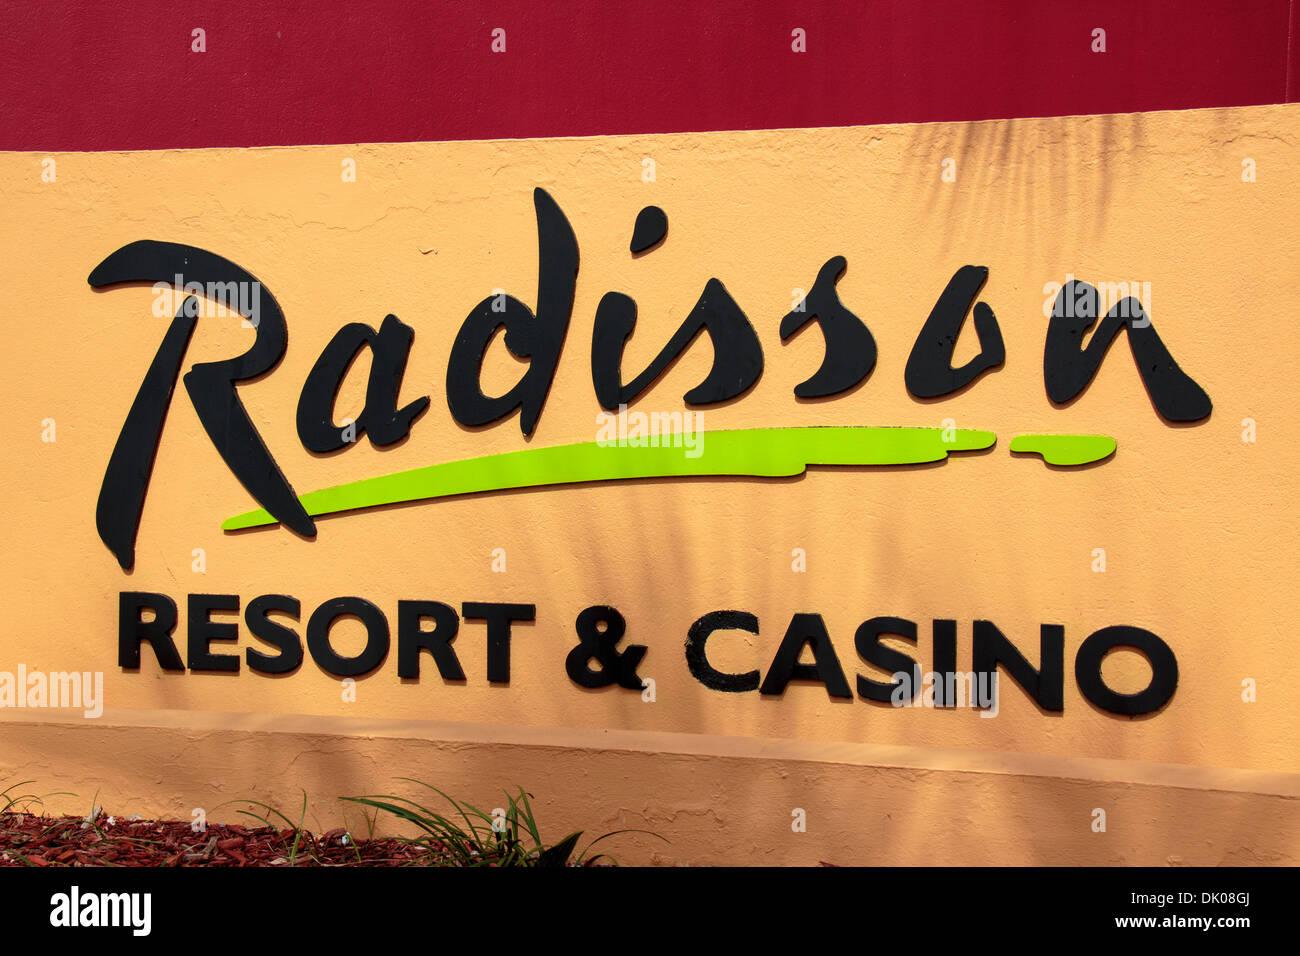 sign for the radisson aruba resort casino & spa entrance from palm